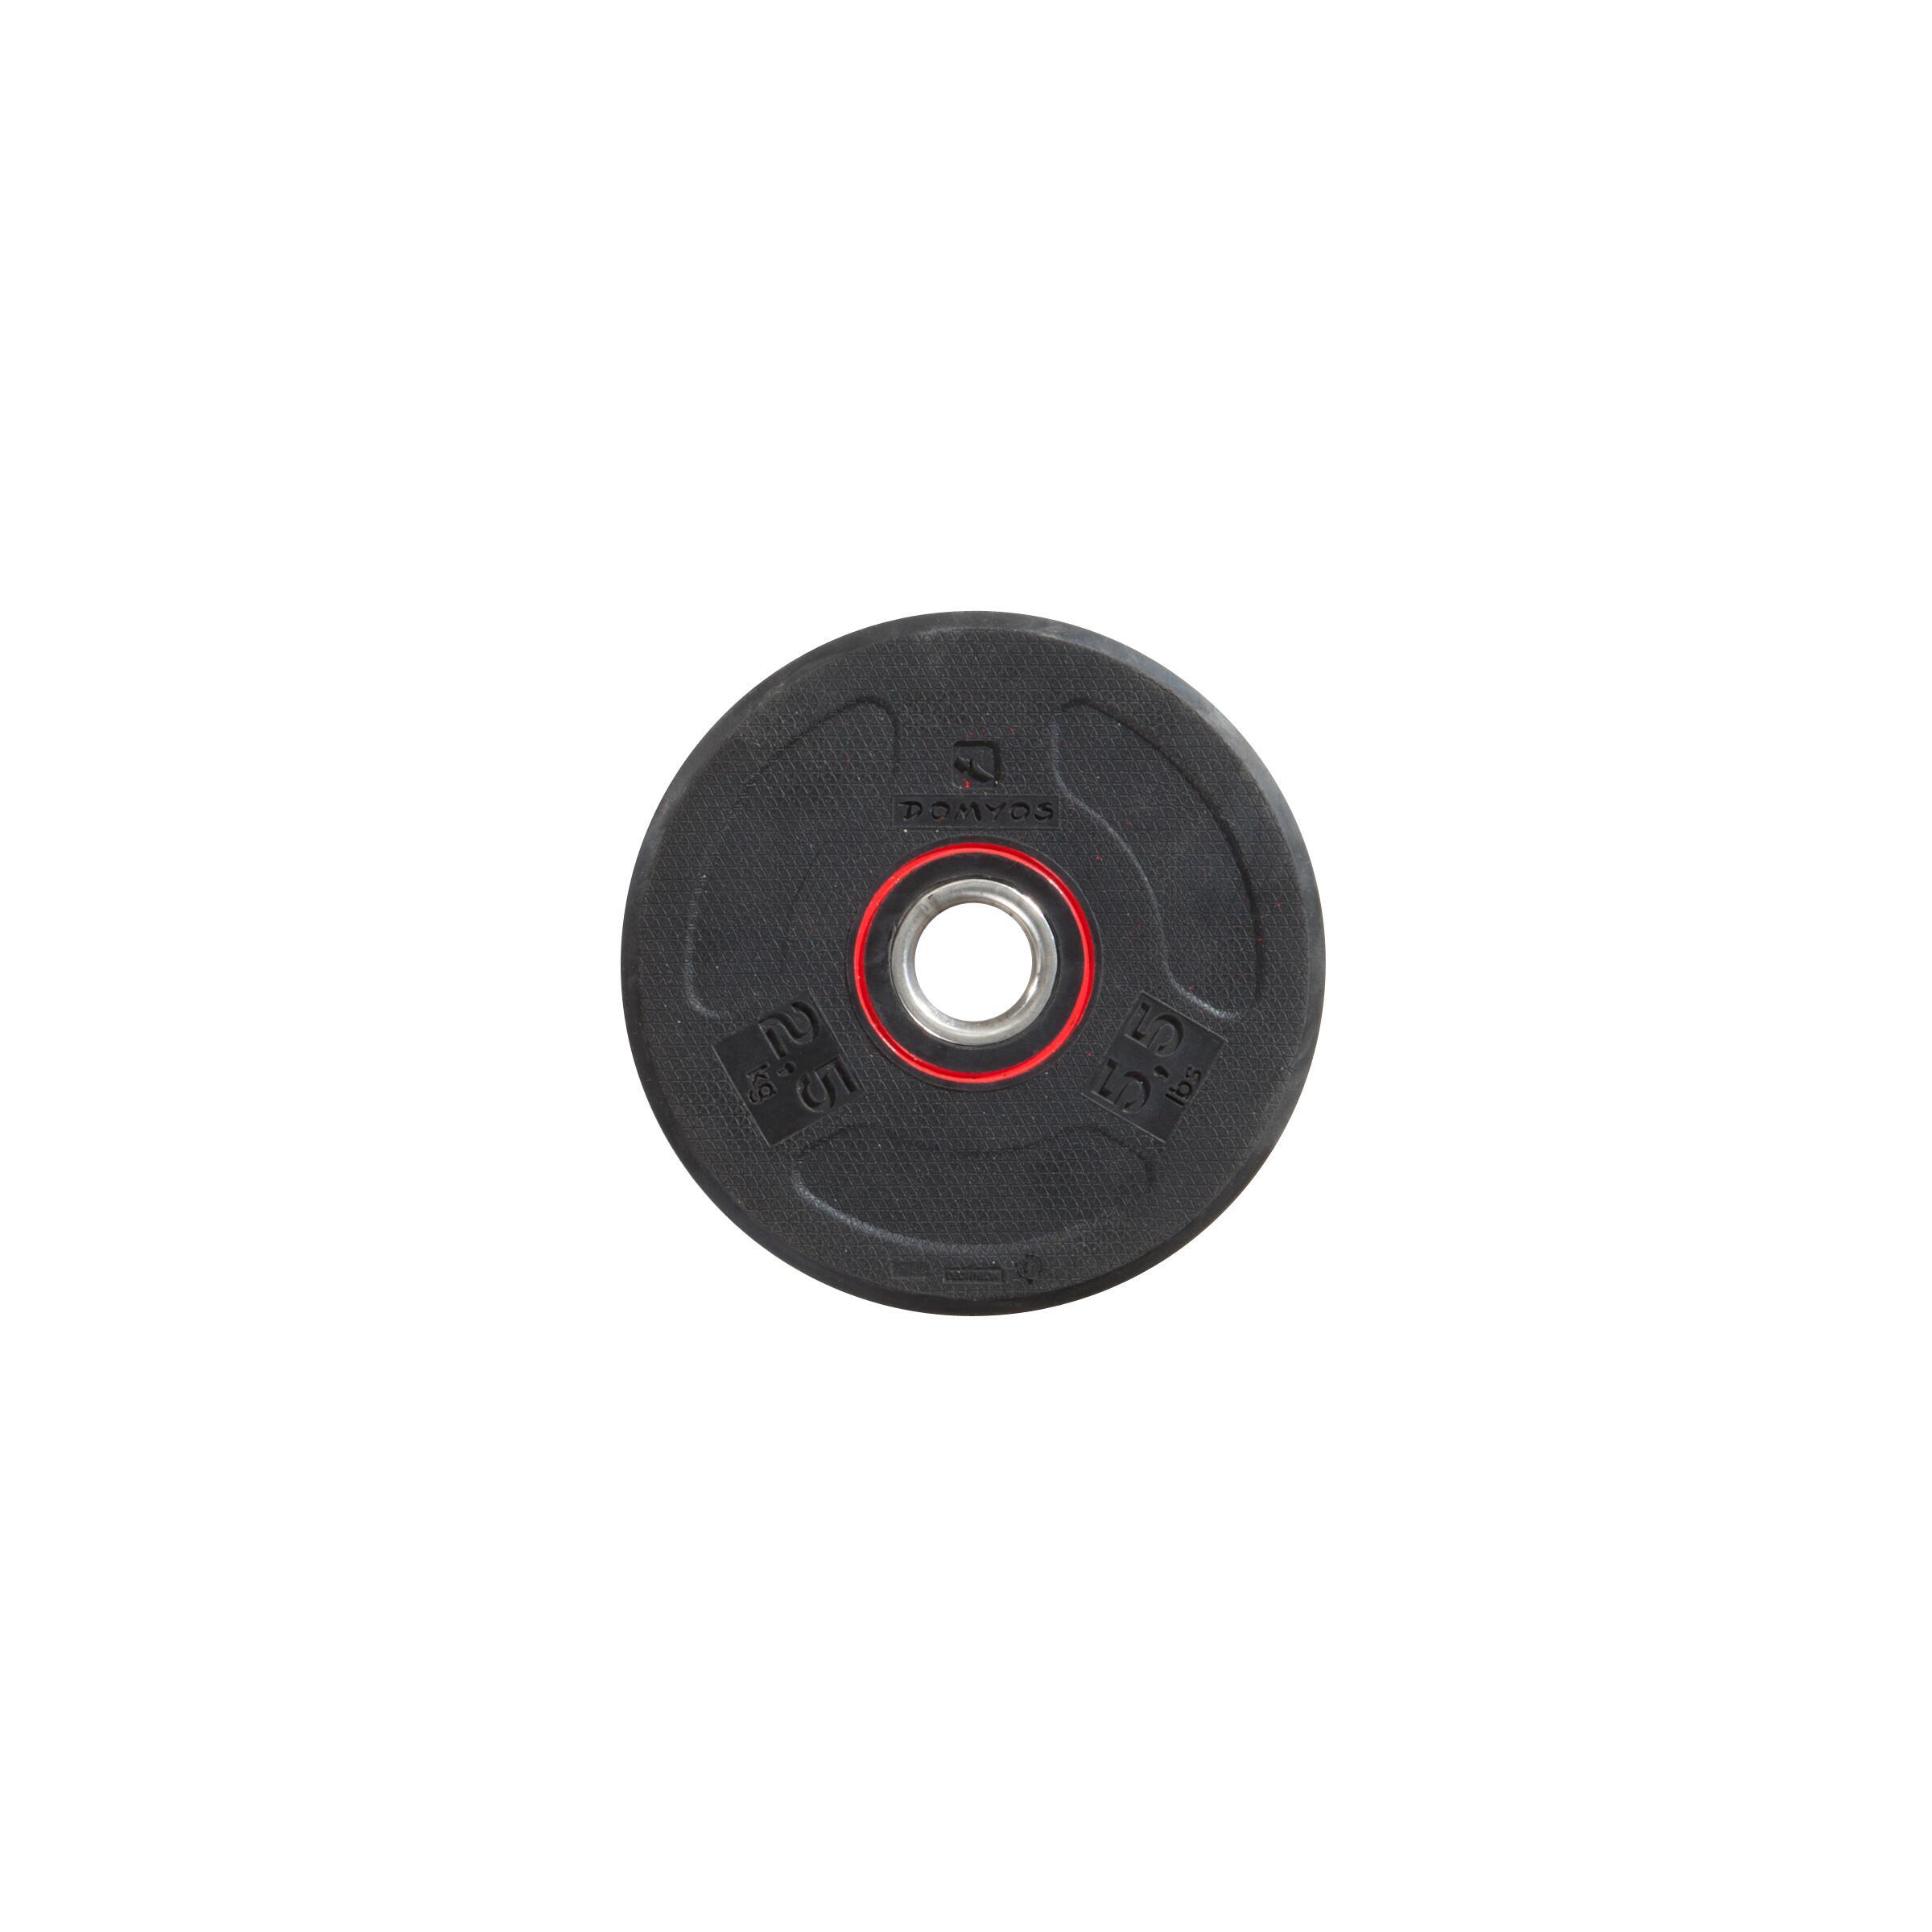 Disco de hule de fisicoculturismo 28 mm 2.5 kg